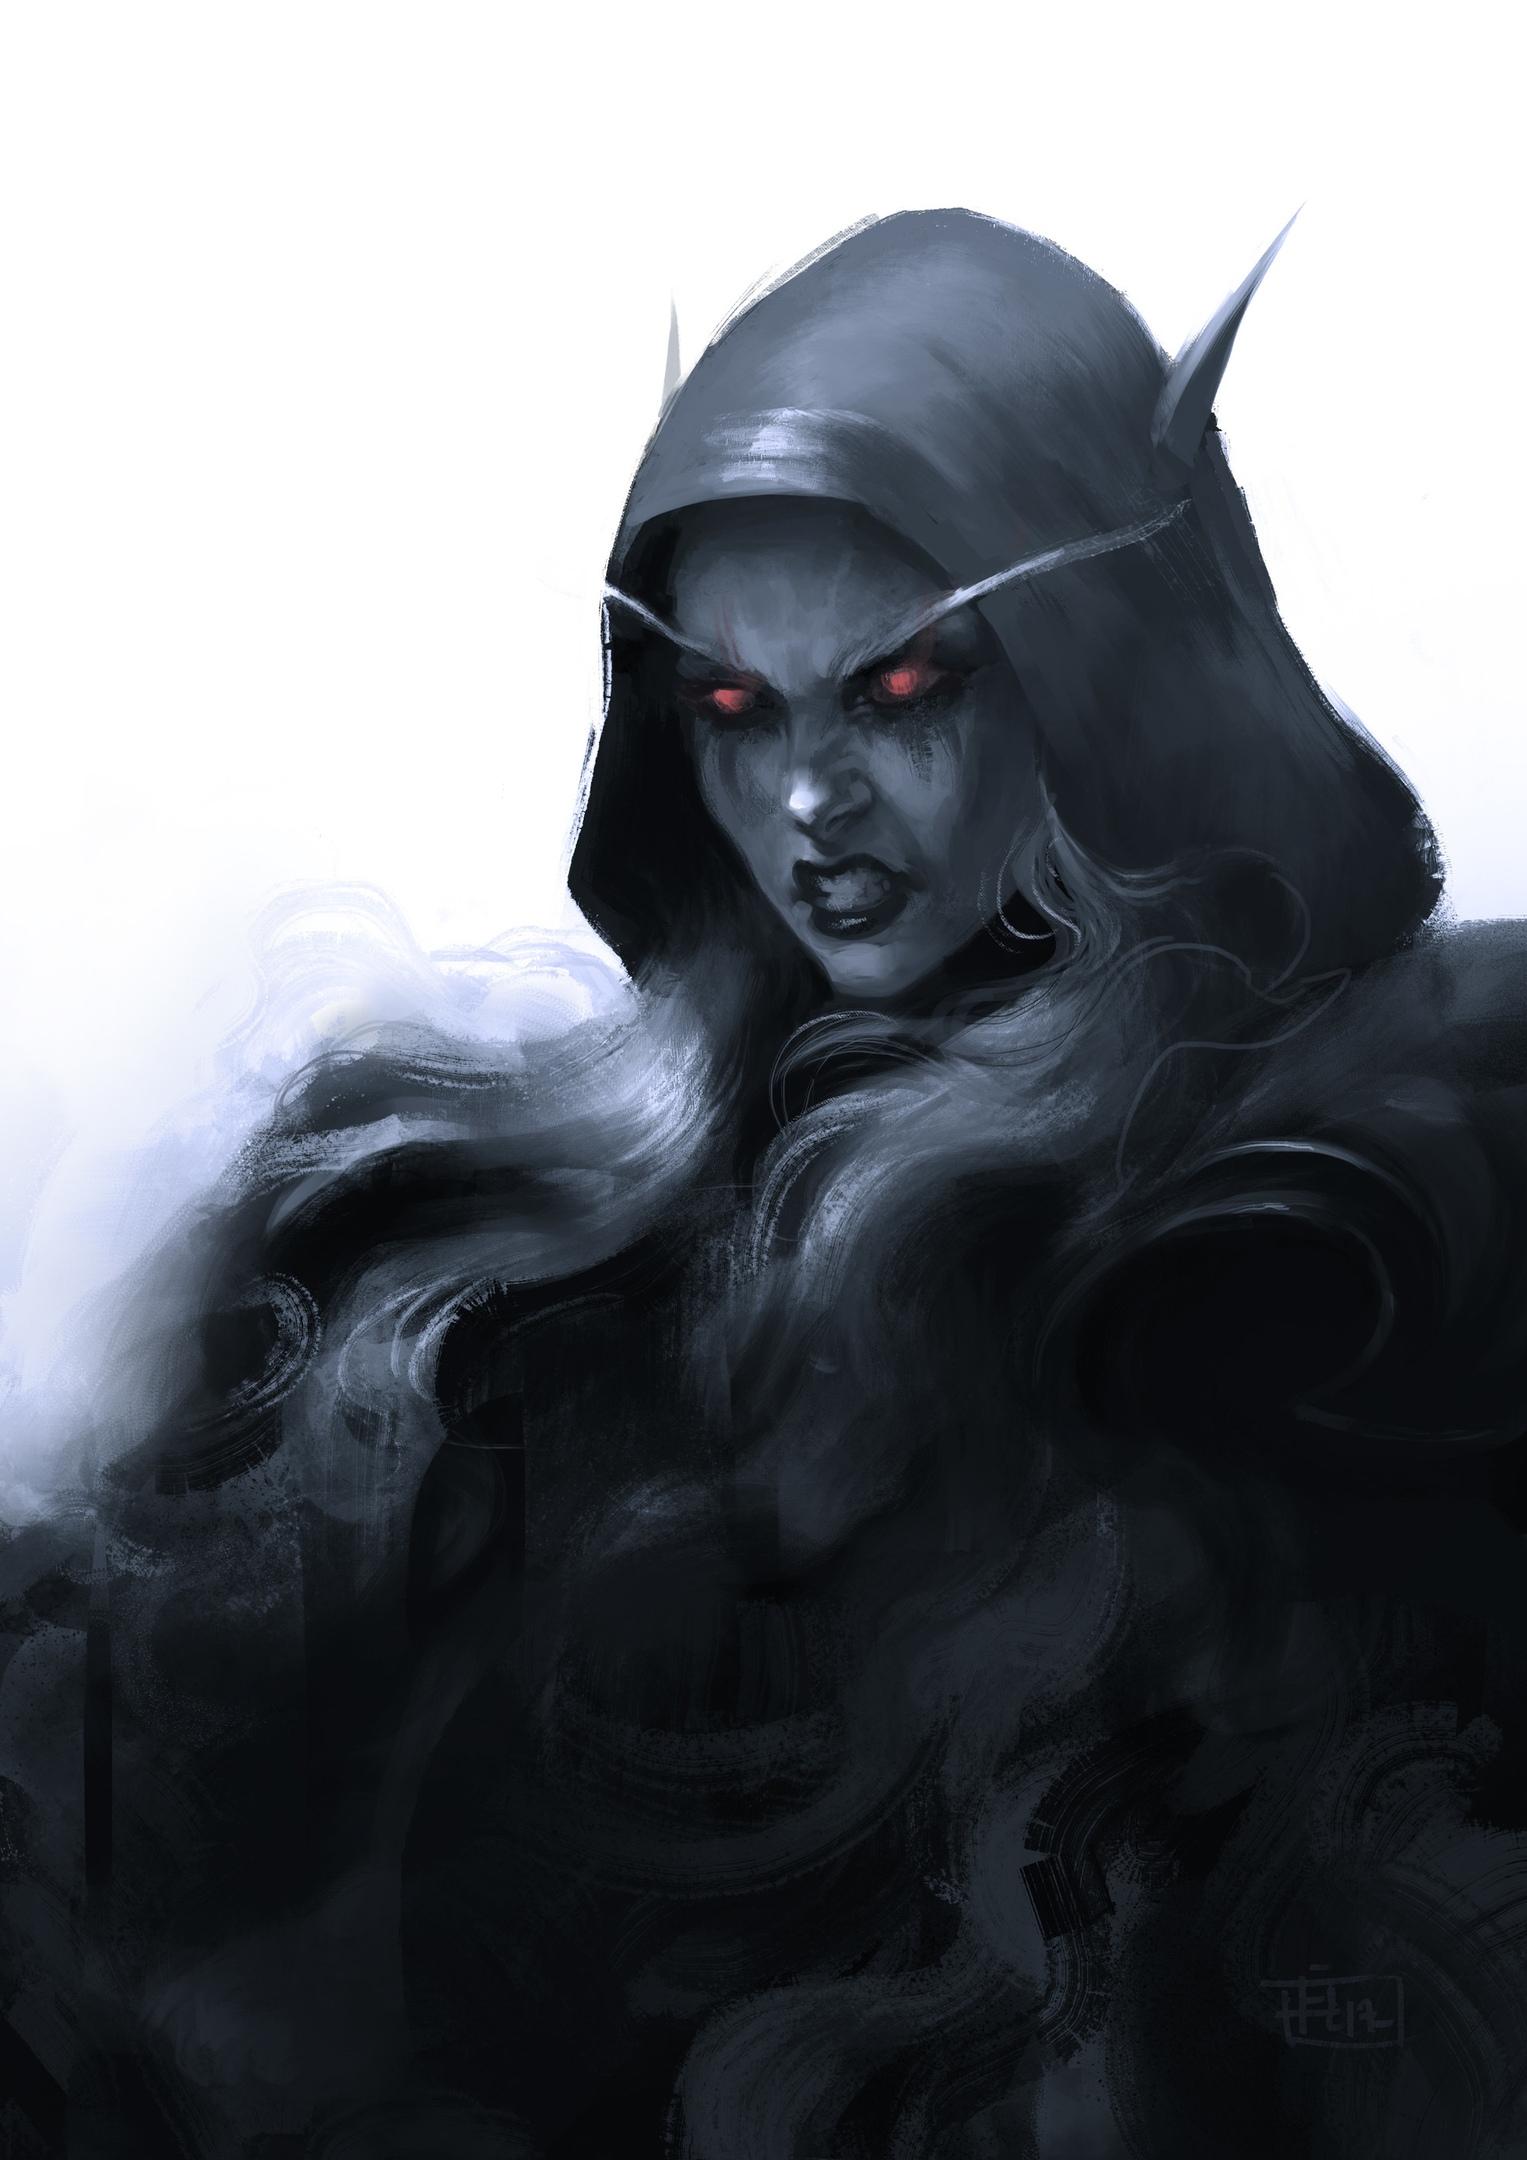 yDASrzAJ0bM.jpg - World of Warcraft